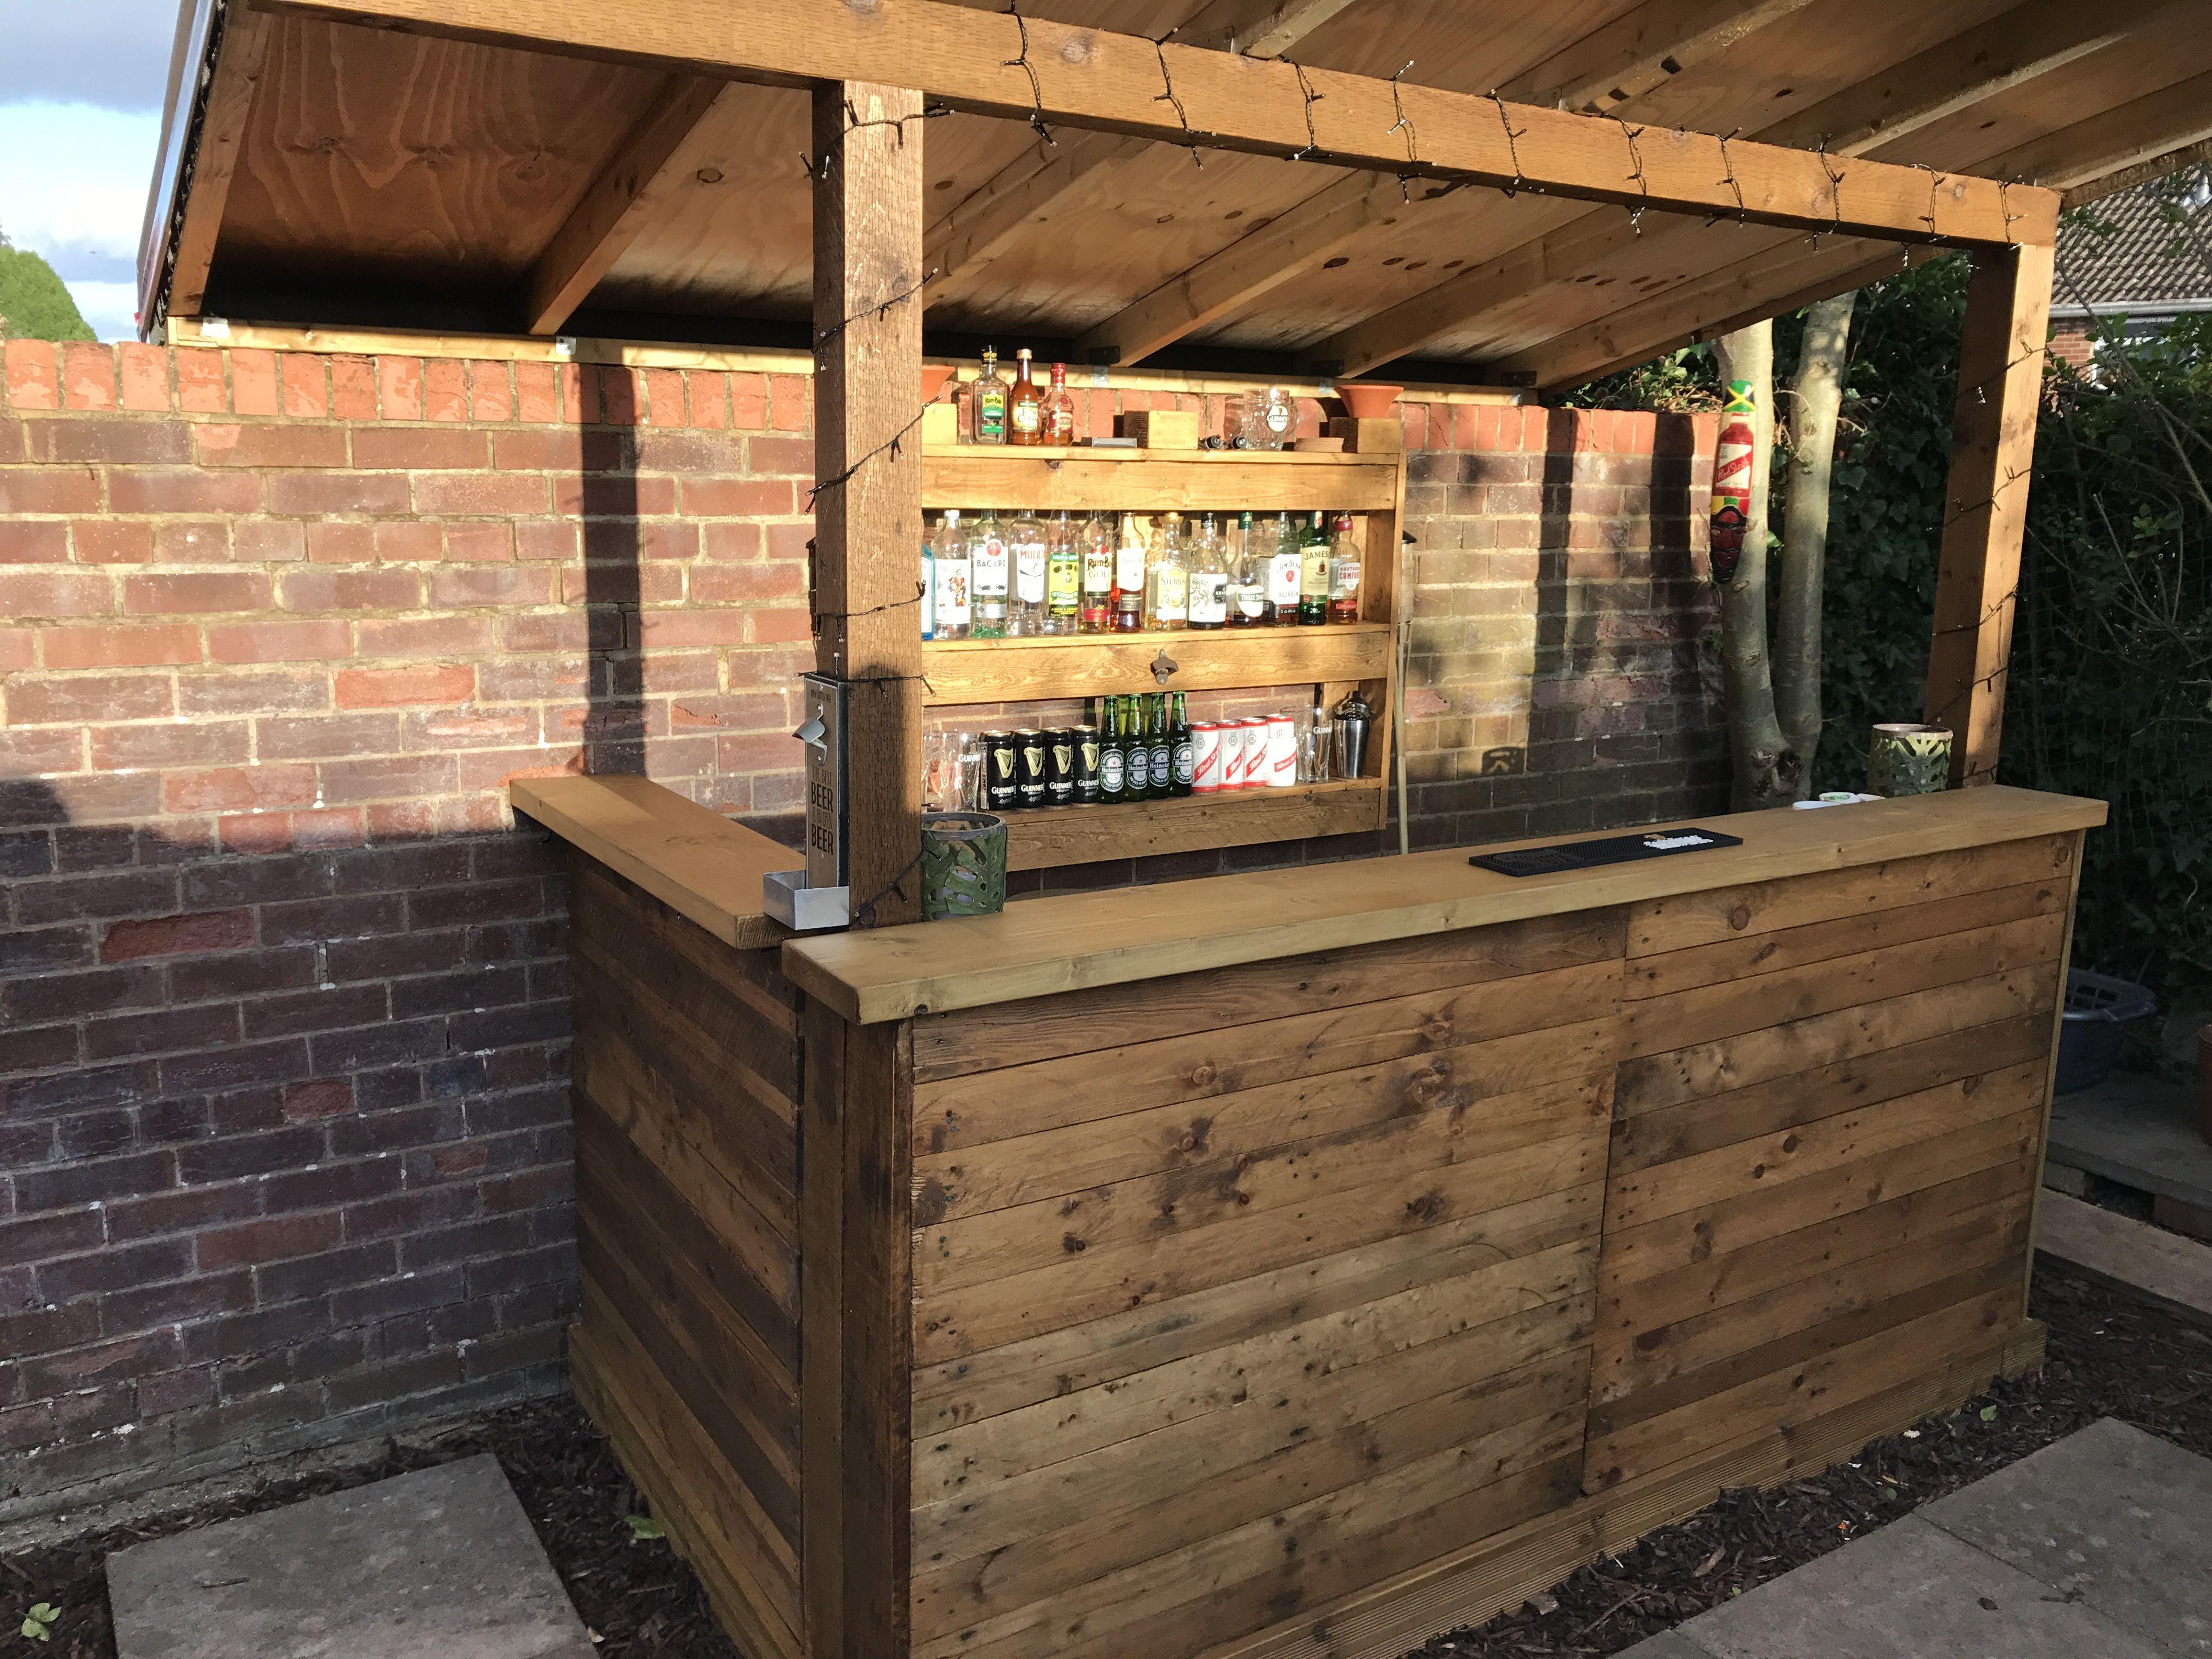 Reclaimed Wood Pallets Outside Garden Bar New Rustic Style Unfinished Outdoor Wood Bar Garden Bar Wooden Garden